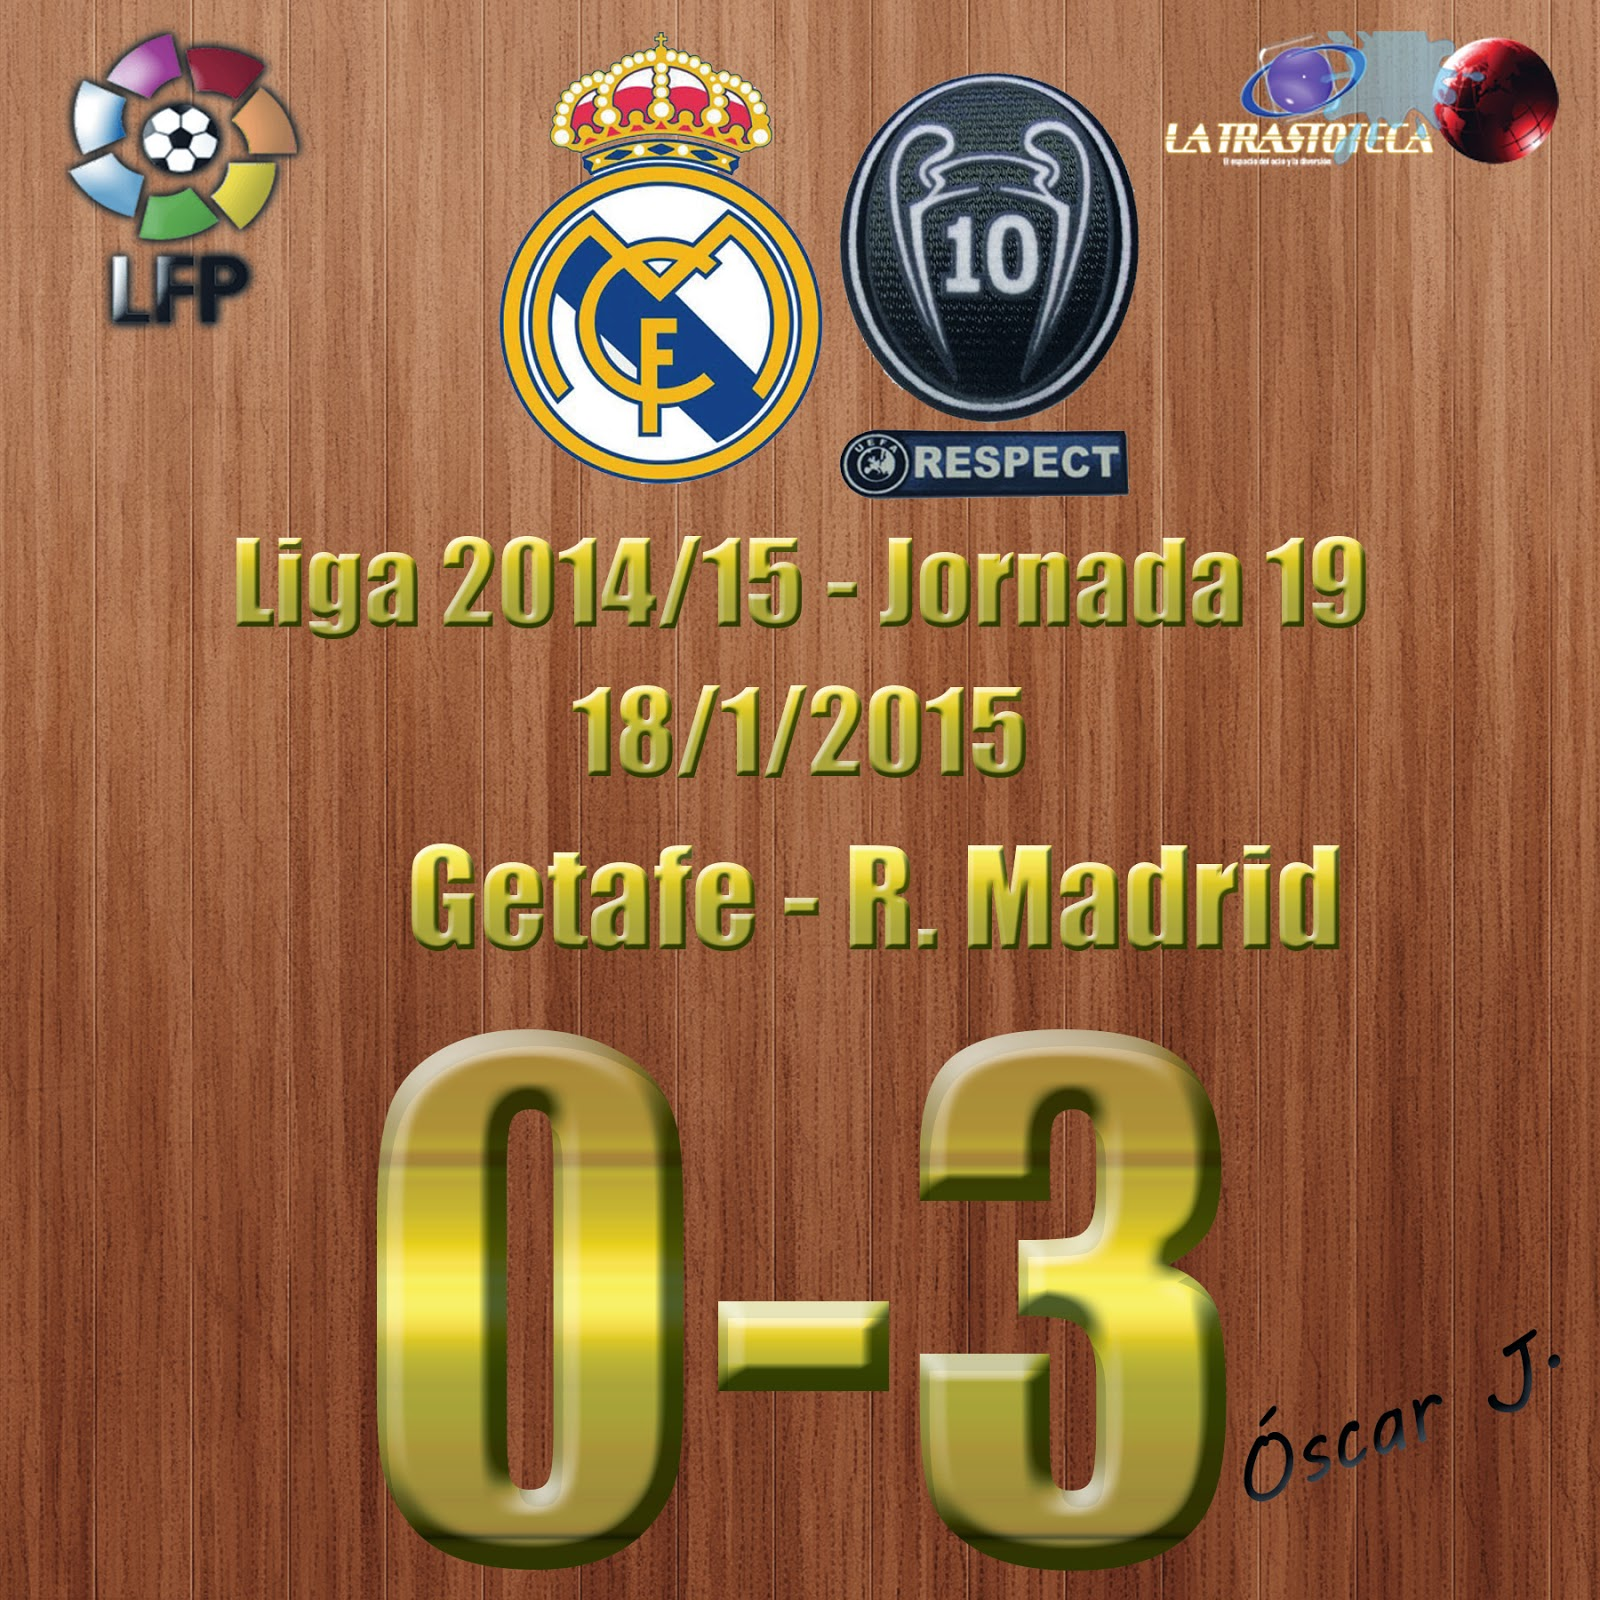 Gareth Bale (0-2) - Getafe 0-3 Real Madrid - Liga 2014/15 - Jornada 19 - (18/1/2015)